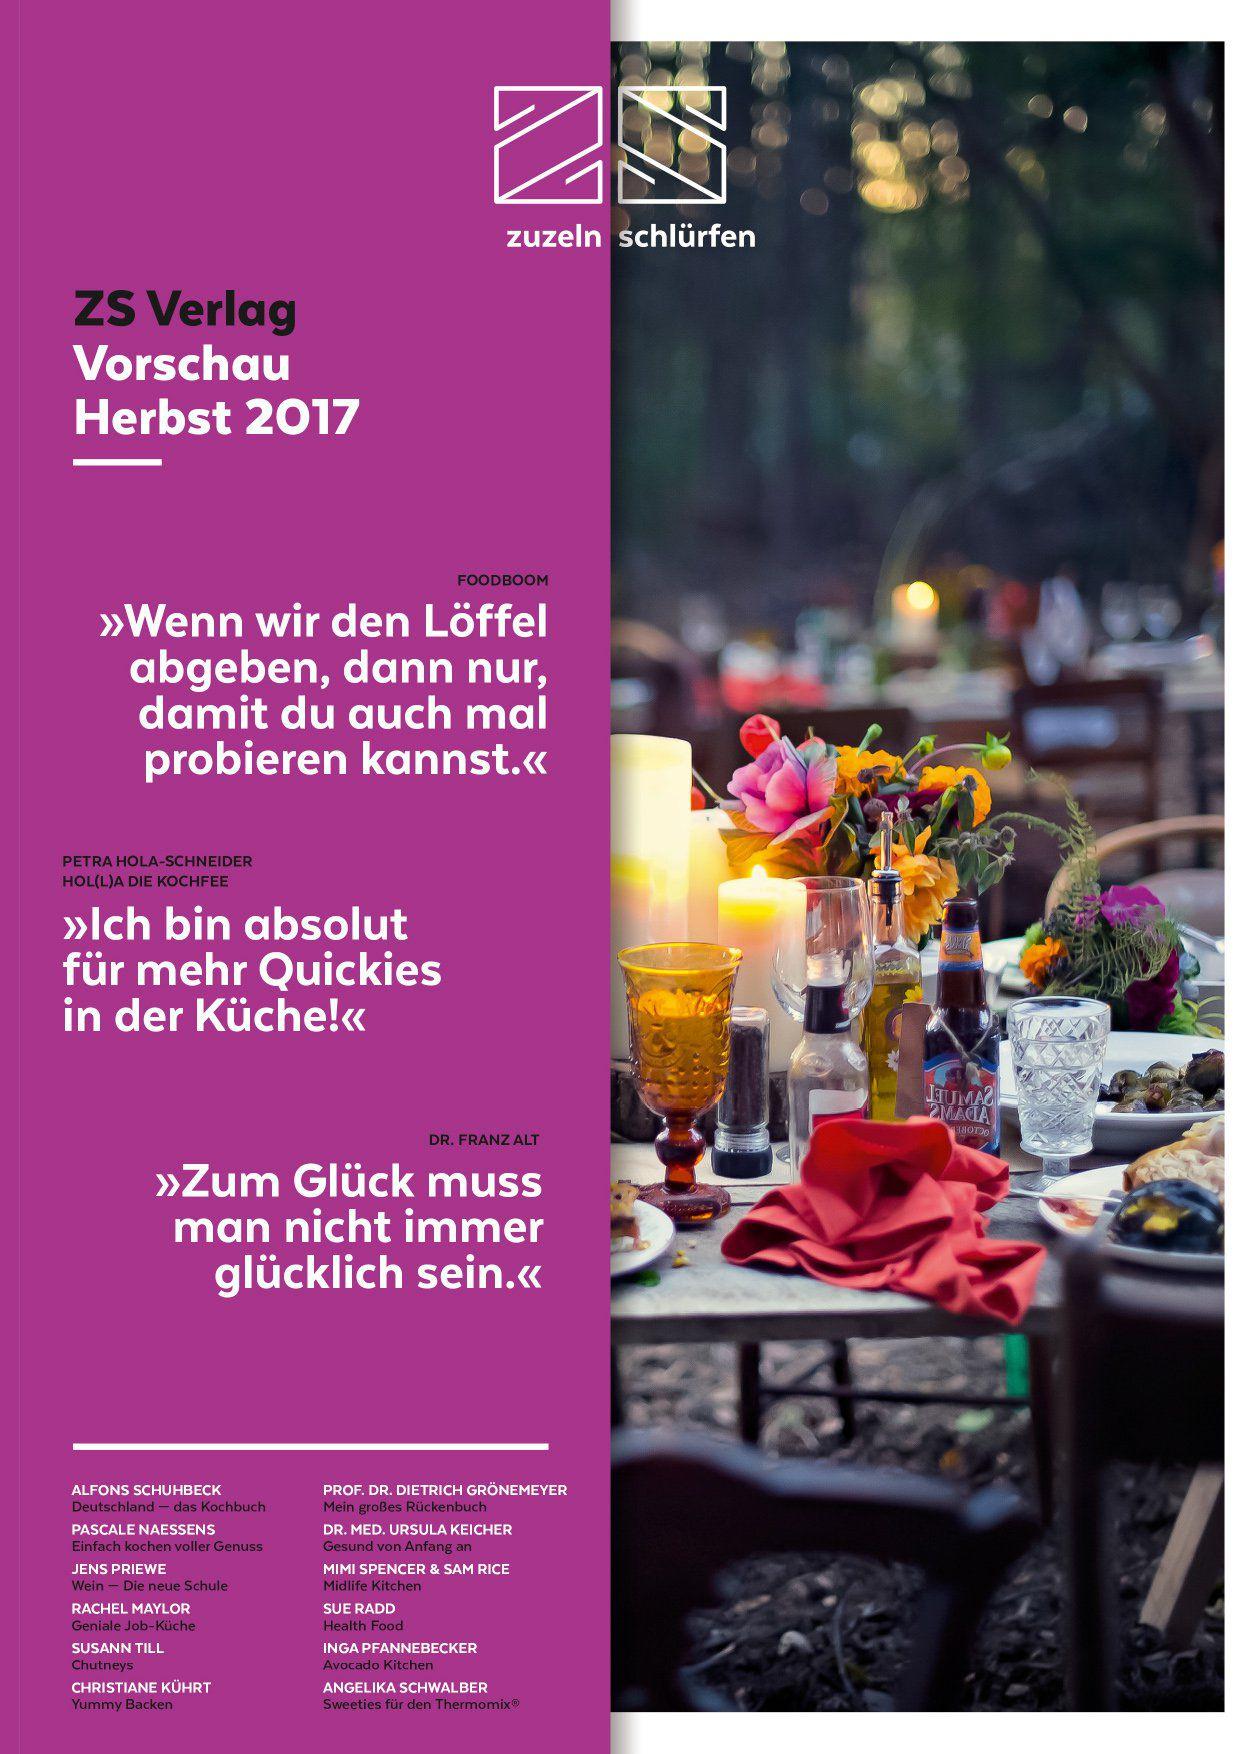 ZS Verlag Herbst 2017